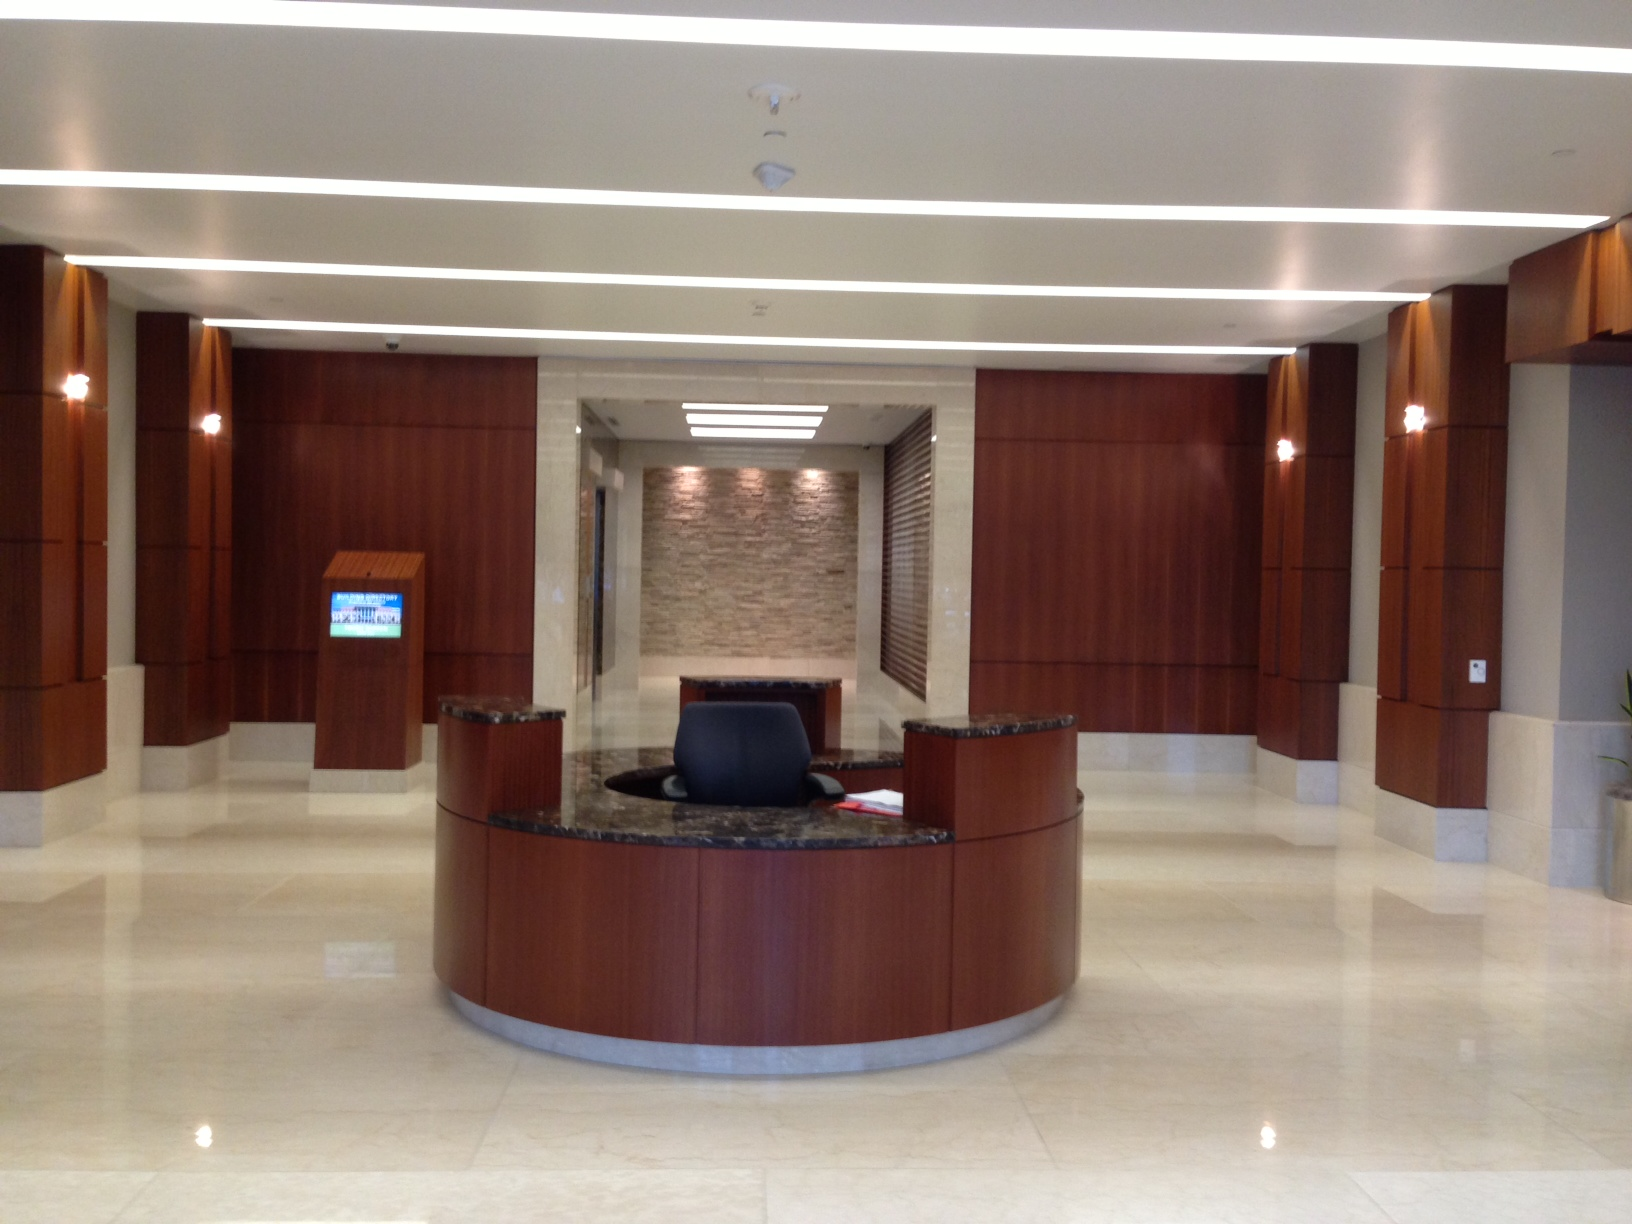 pgnl-architech-lobby-architecture